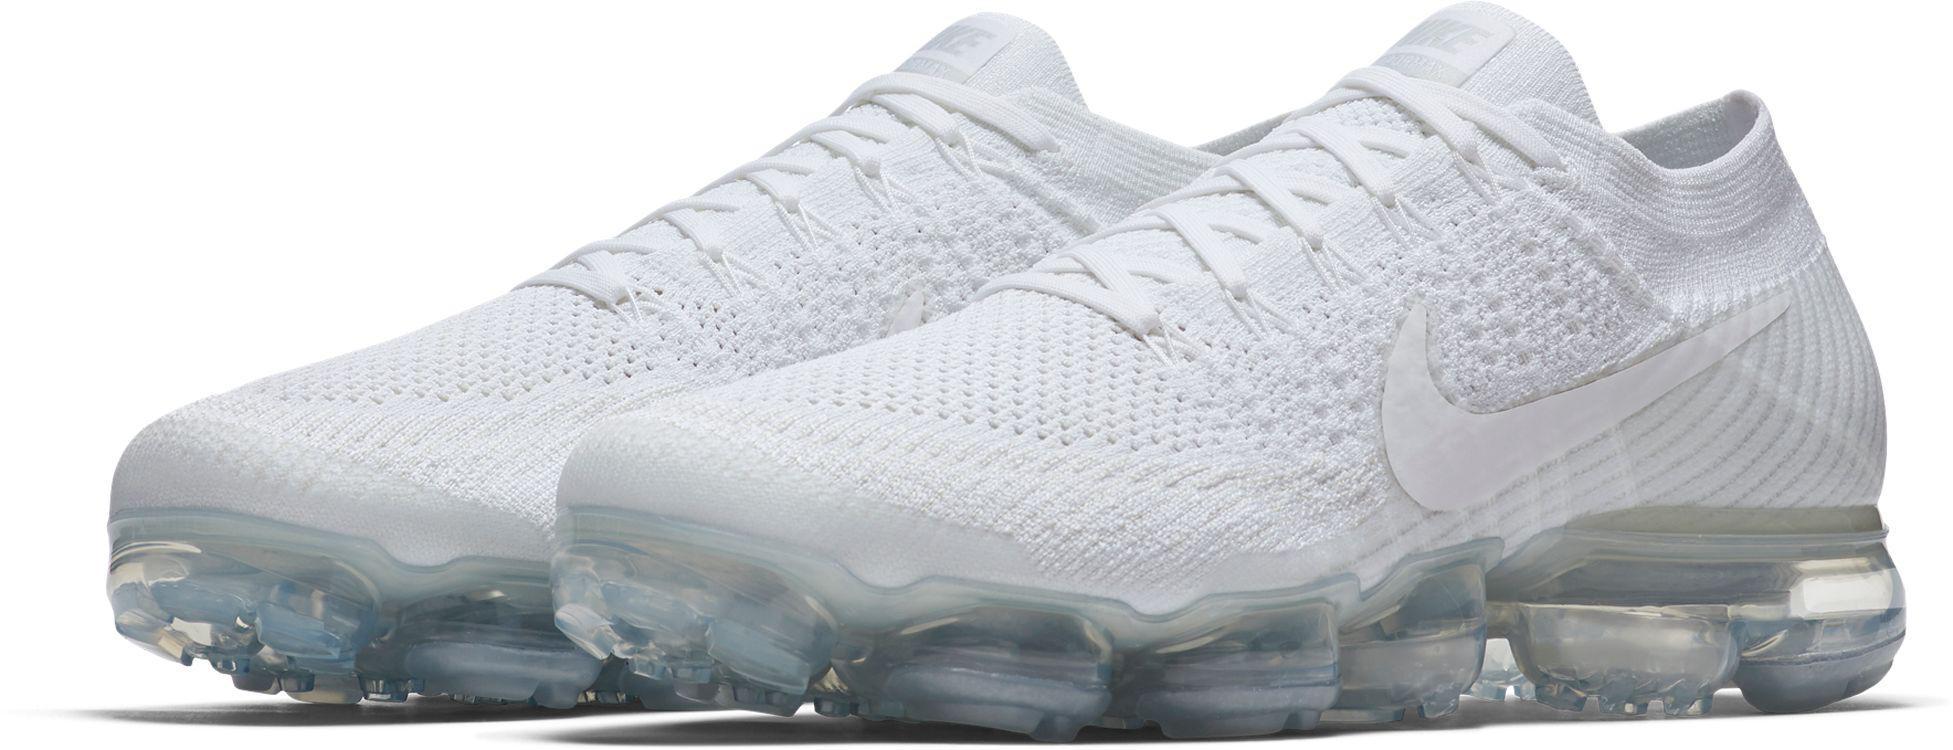 d00fd8e5e0bf0 Lyst - Nike Air Vapormax Flyknit Running Shoes in White for Men